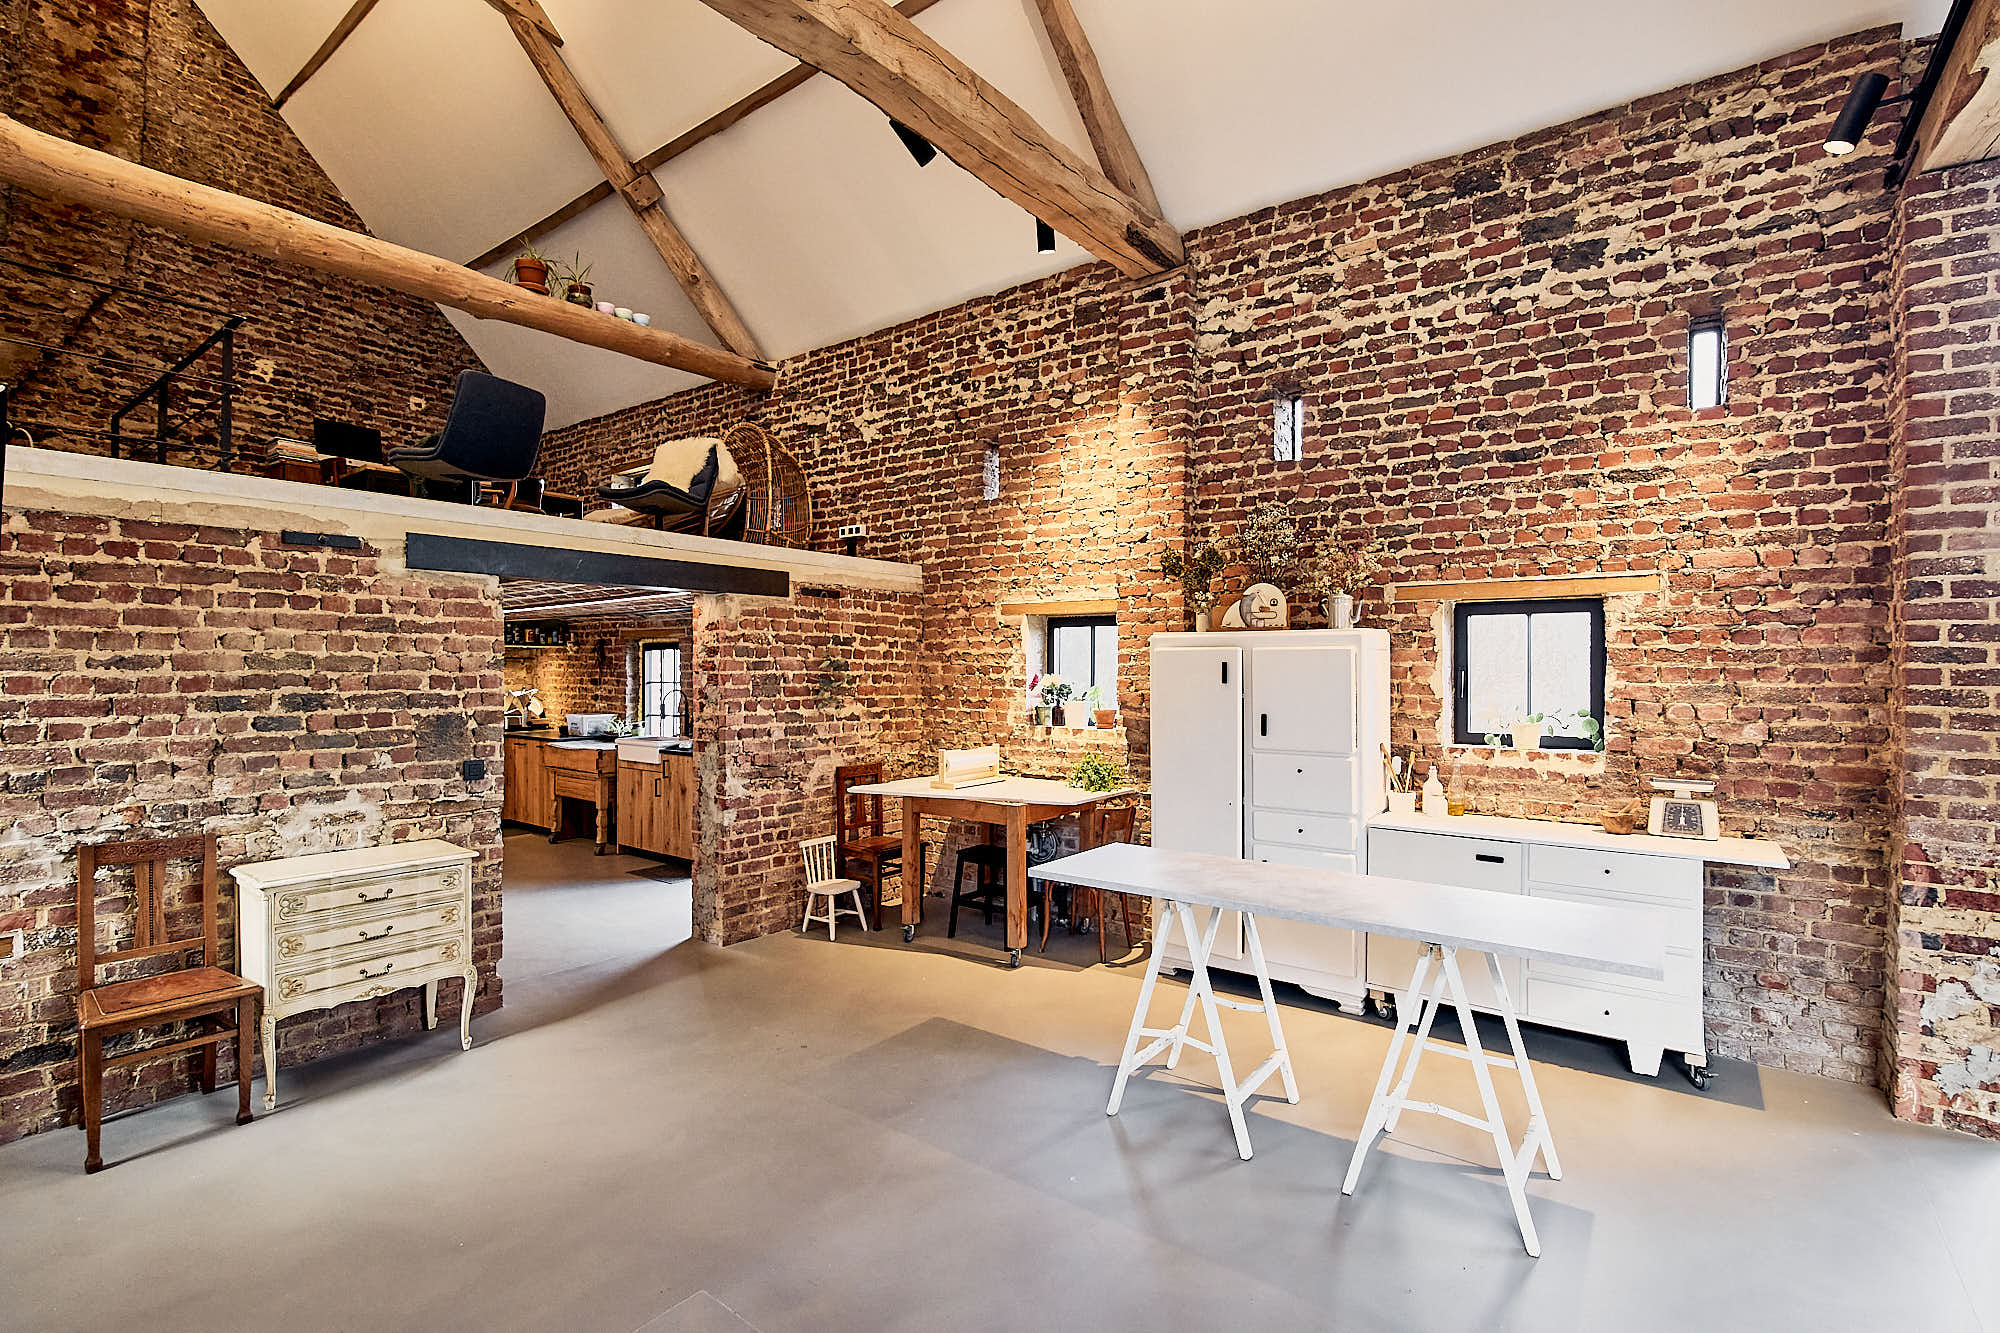 Modular Set Furniture In A Rustic Studio Space And A Kichen In The Background